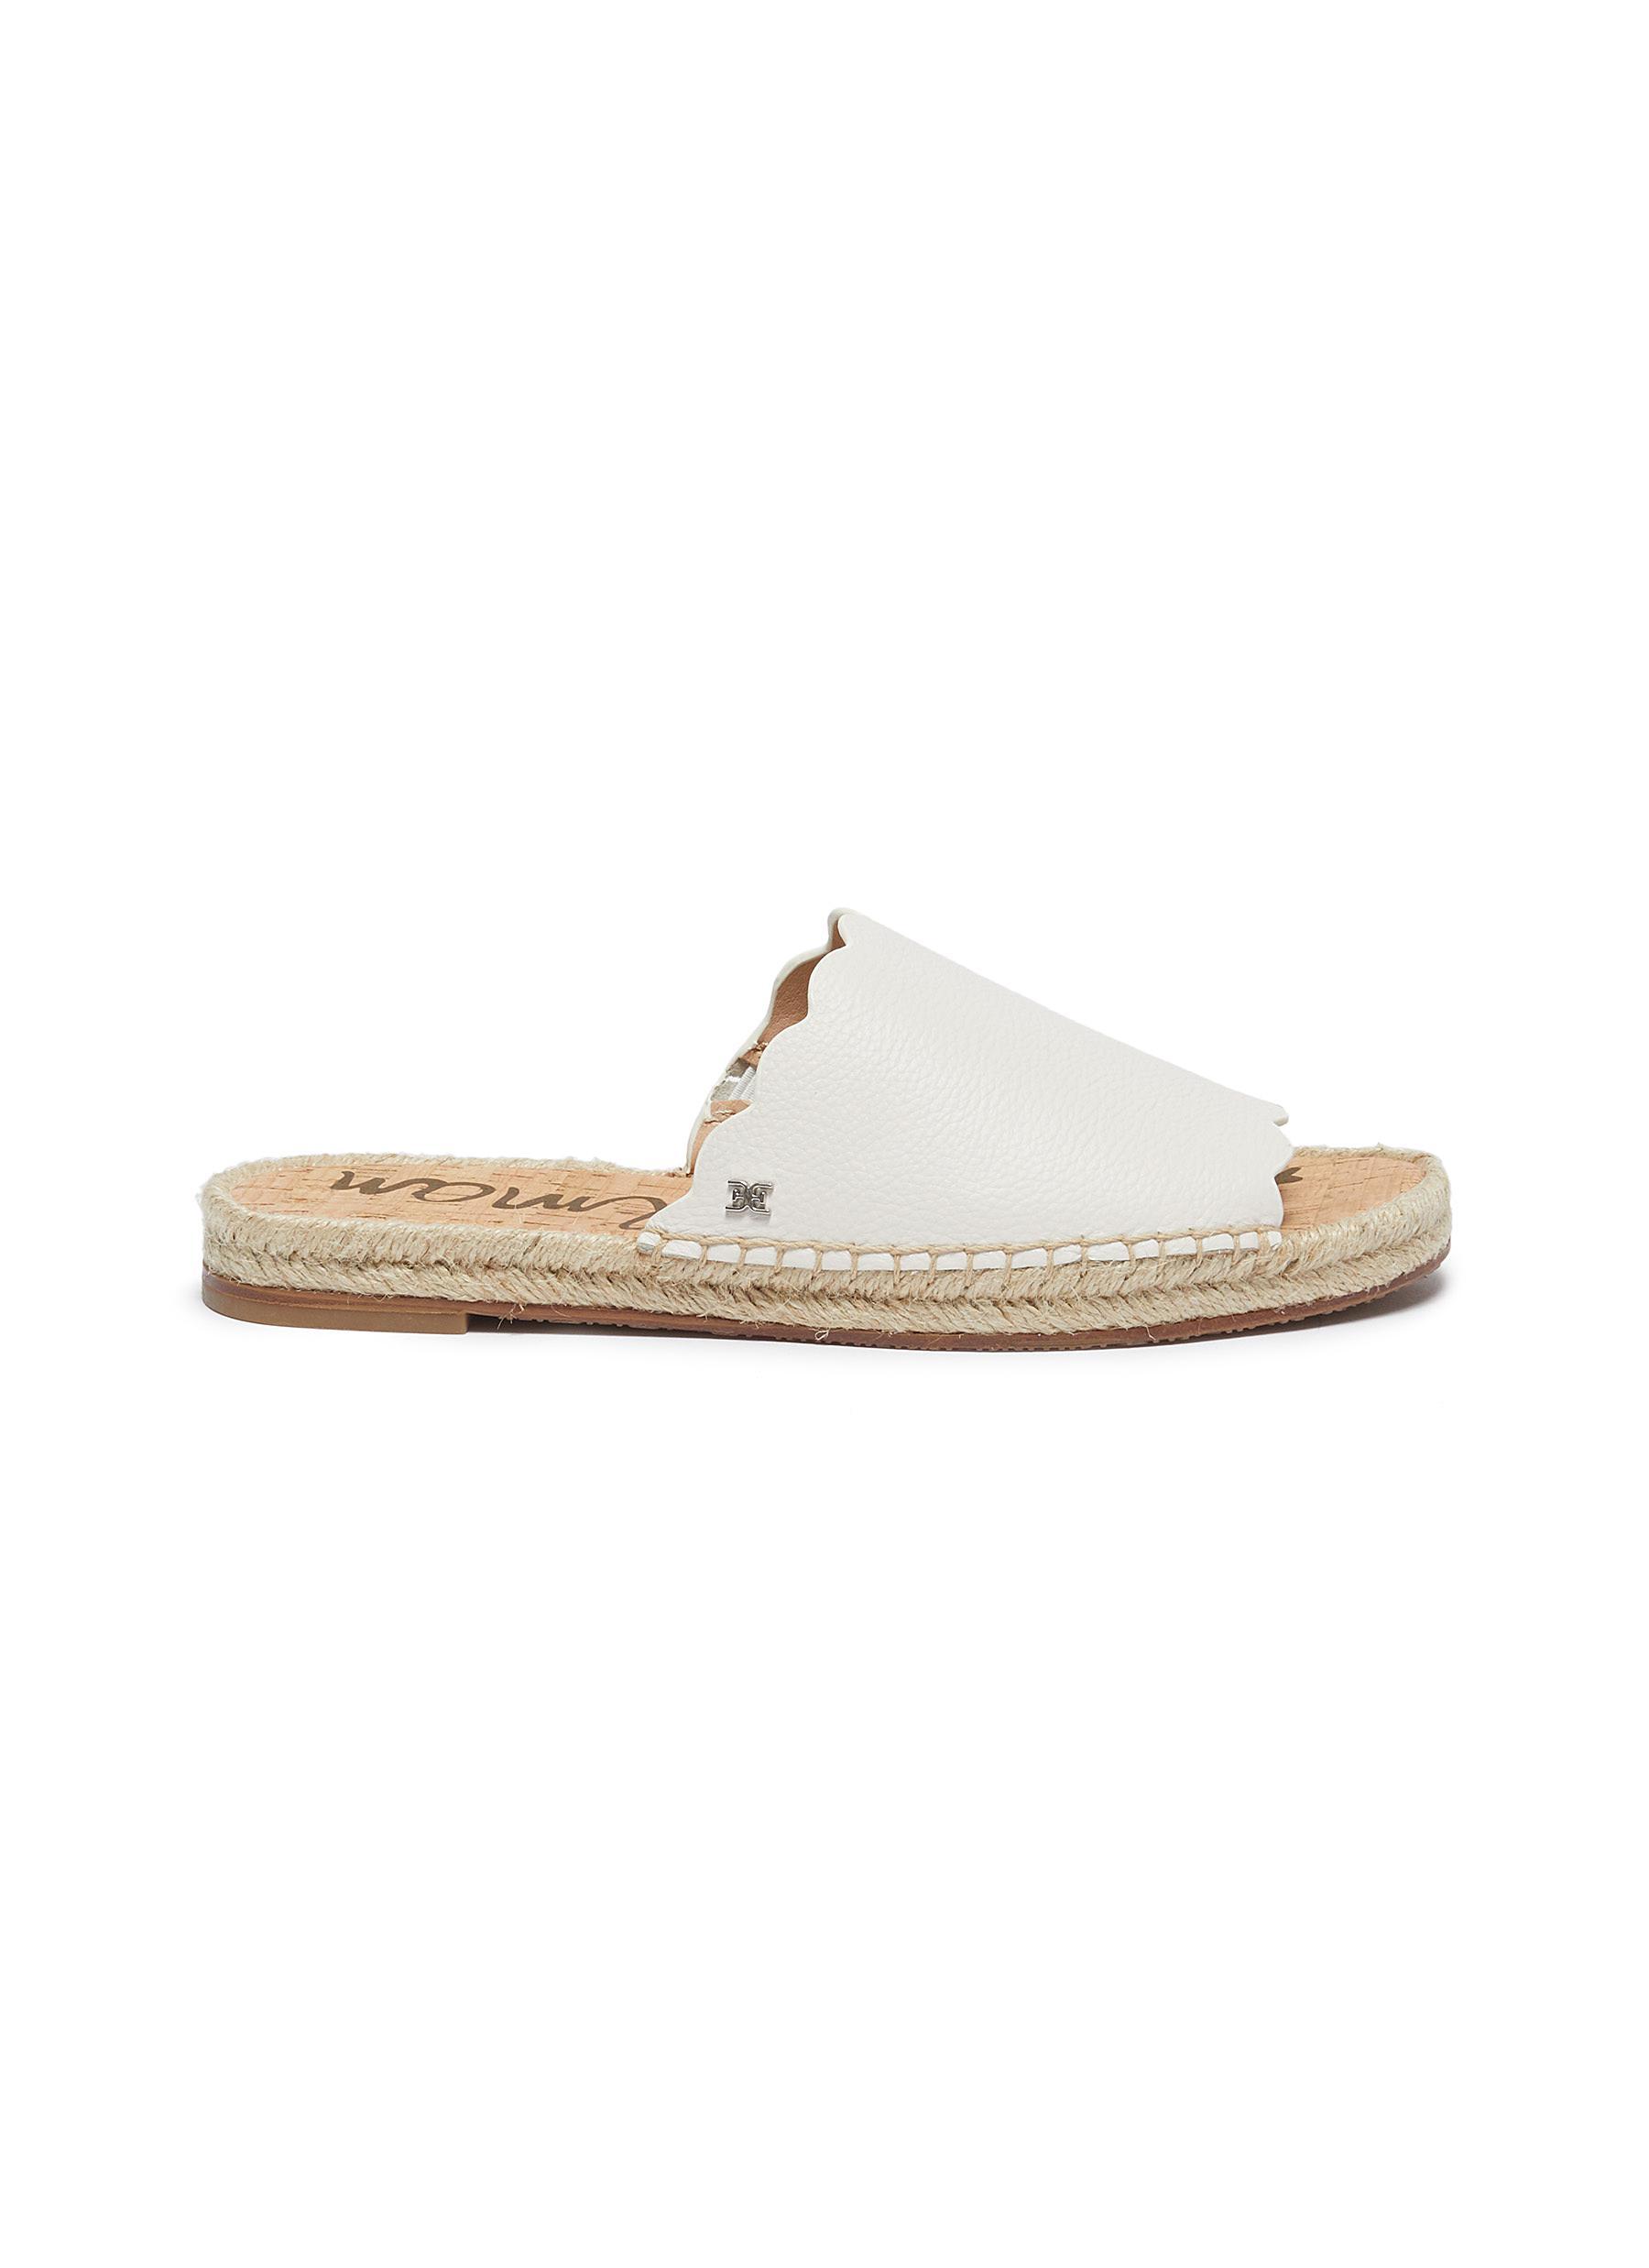 31f2d34f9f39 Sam Edelman.  Andy  scalloped leather espadrille slide sandals